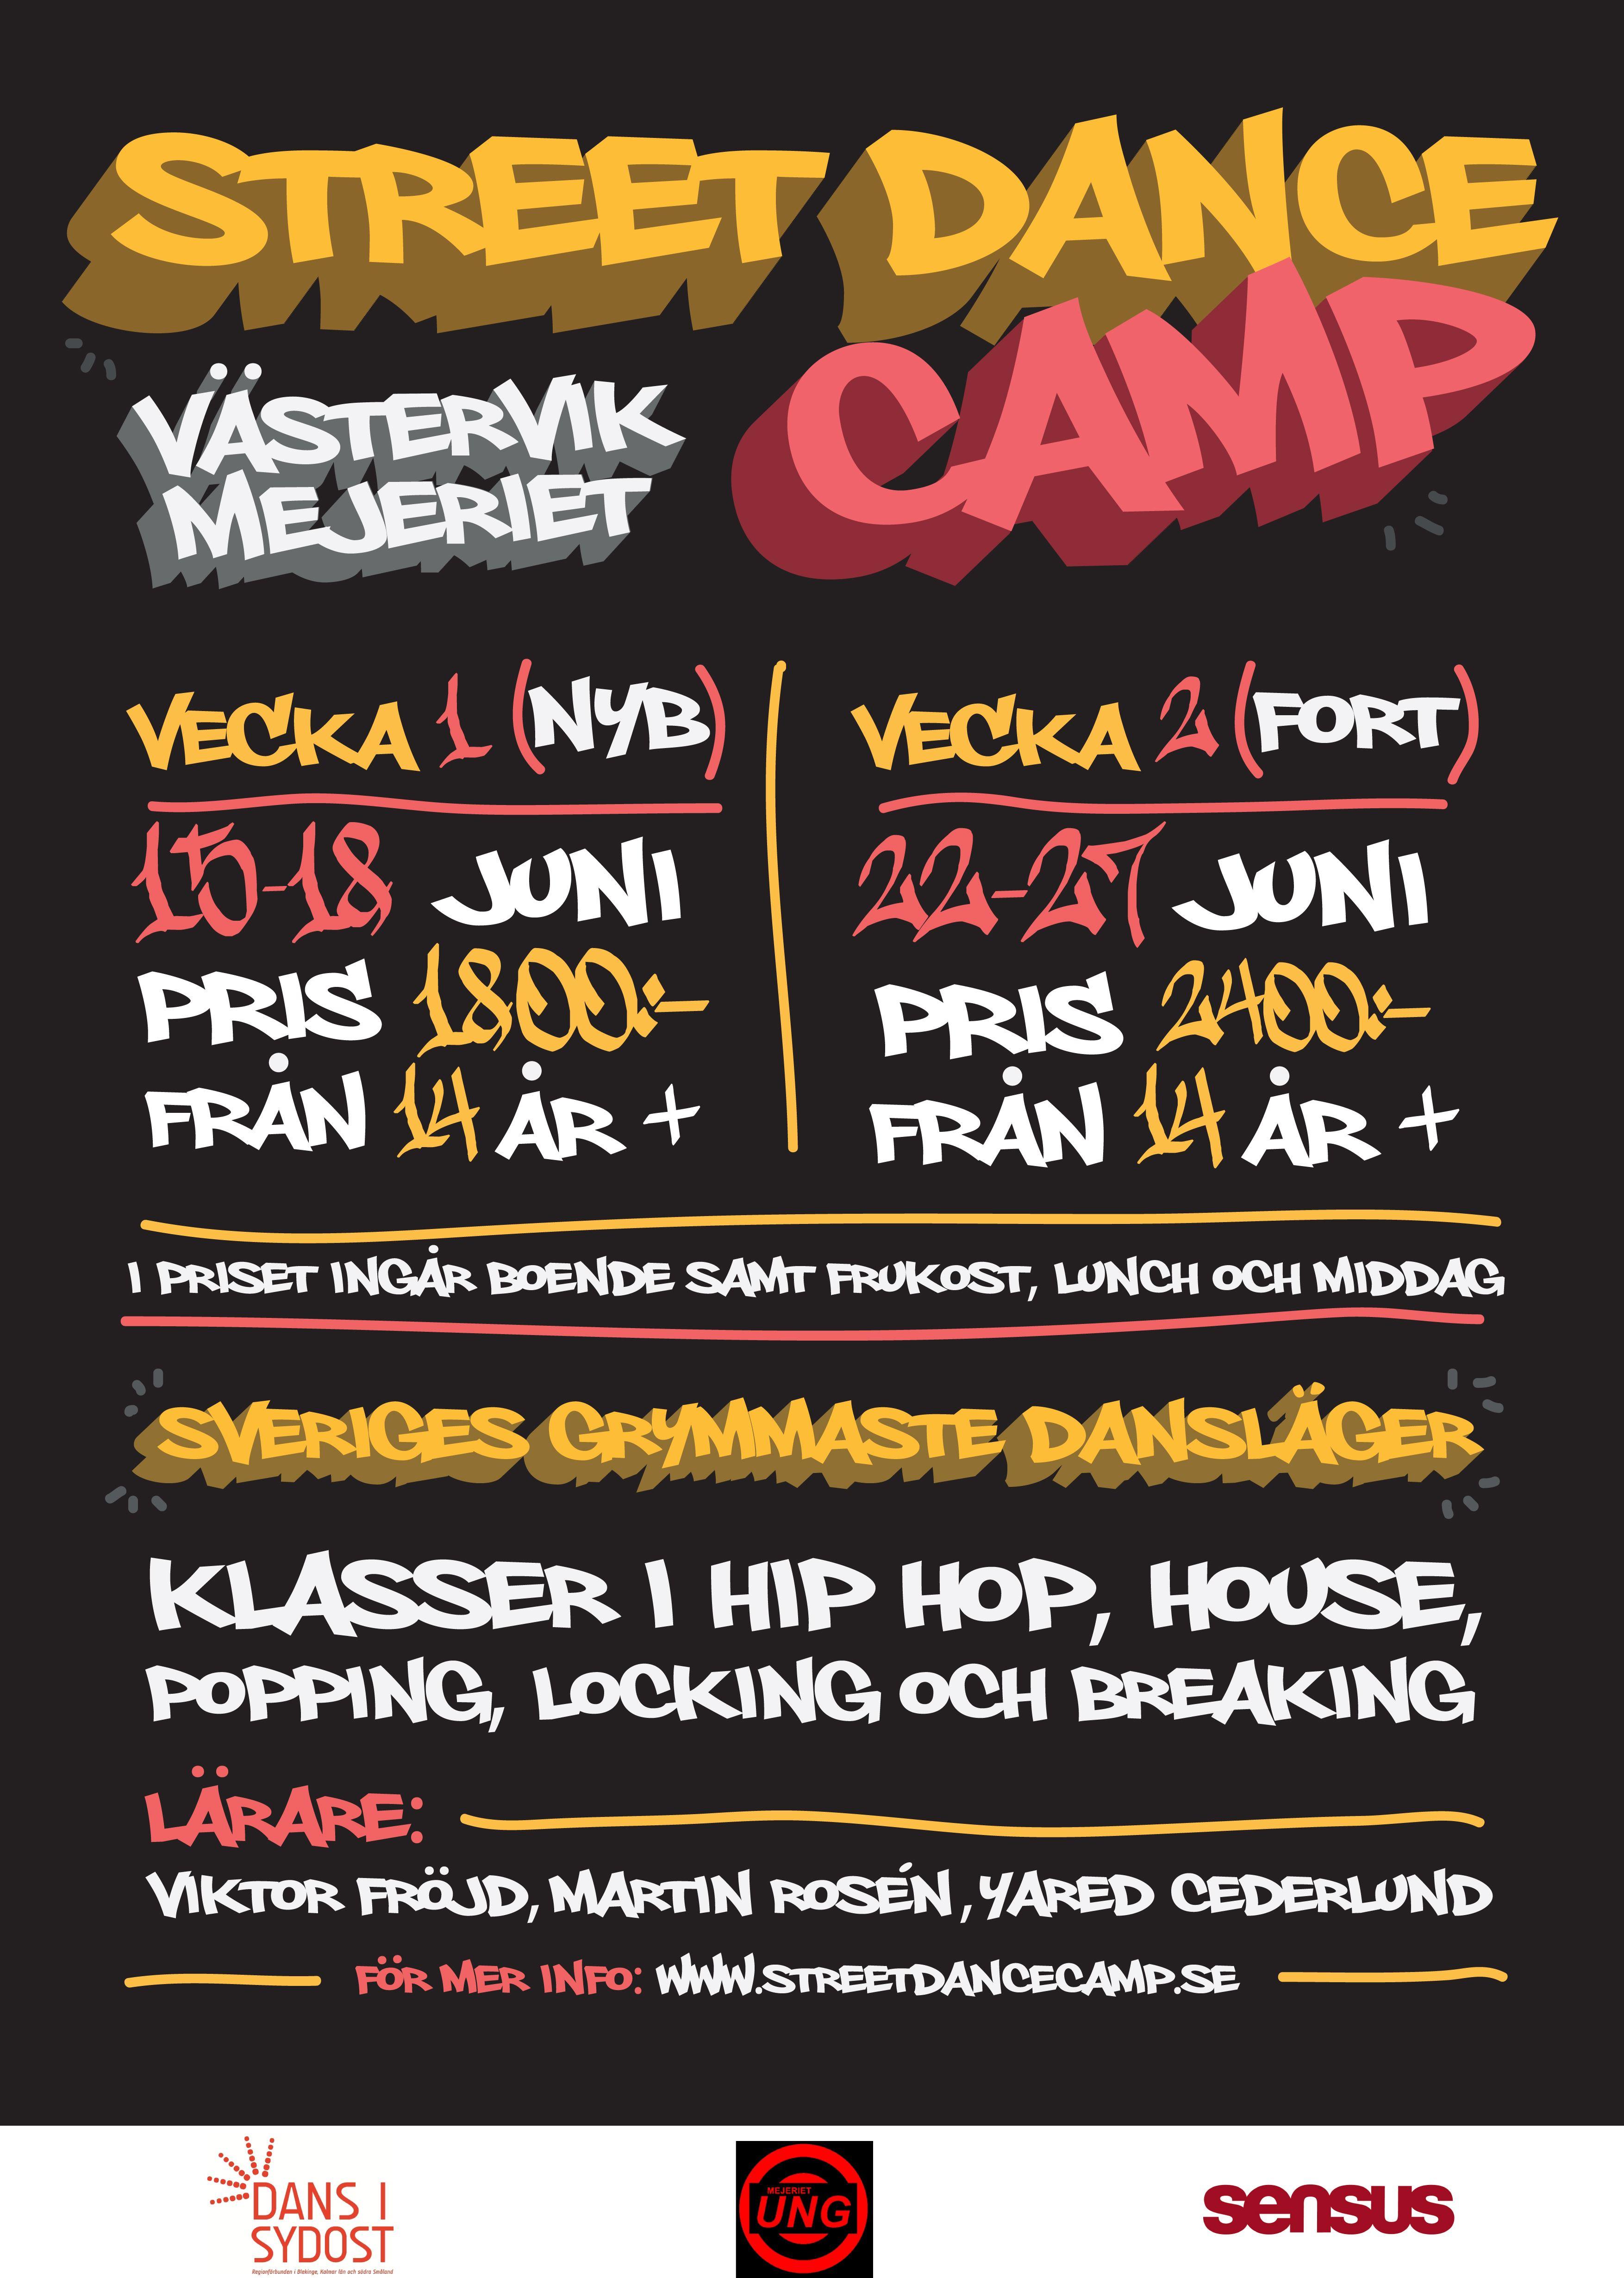 Streetdance Camp 2015